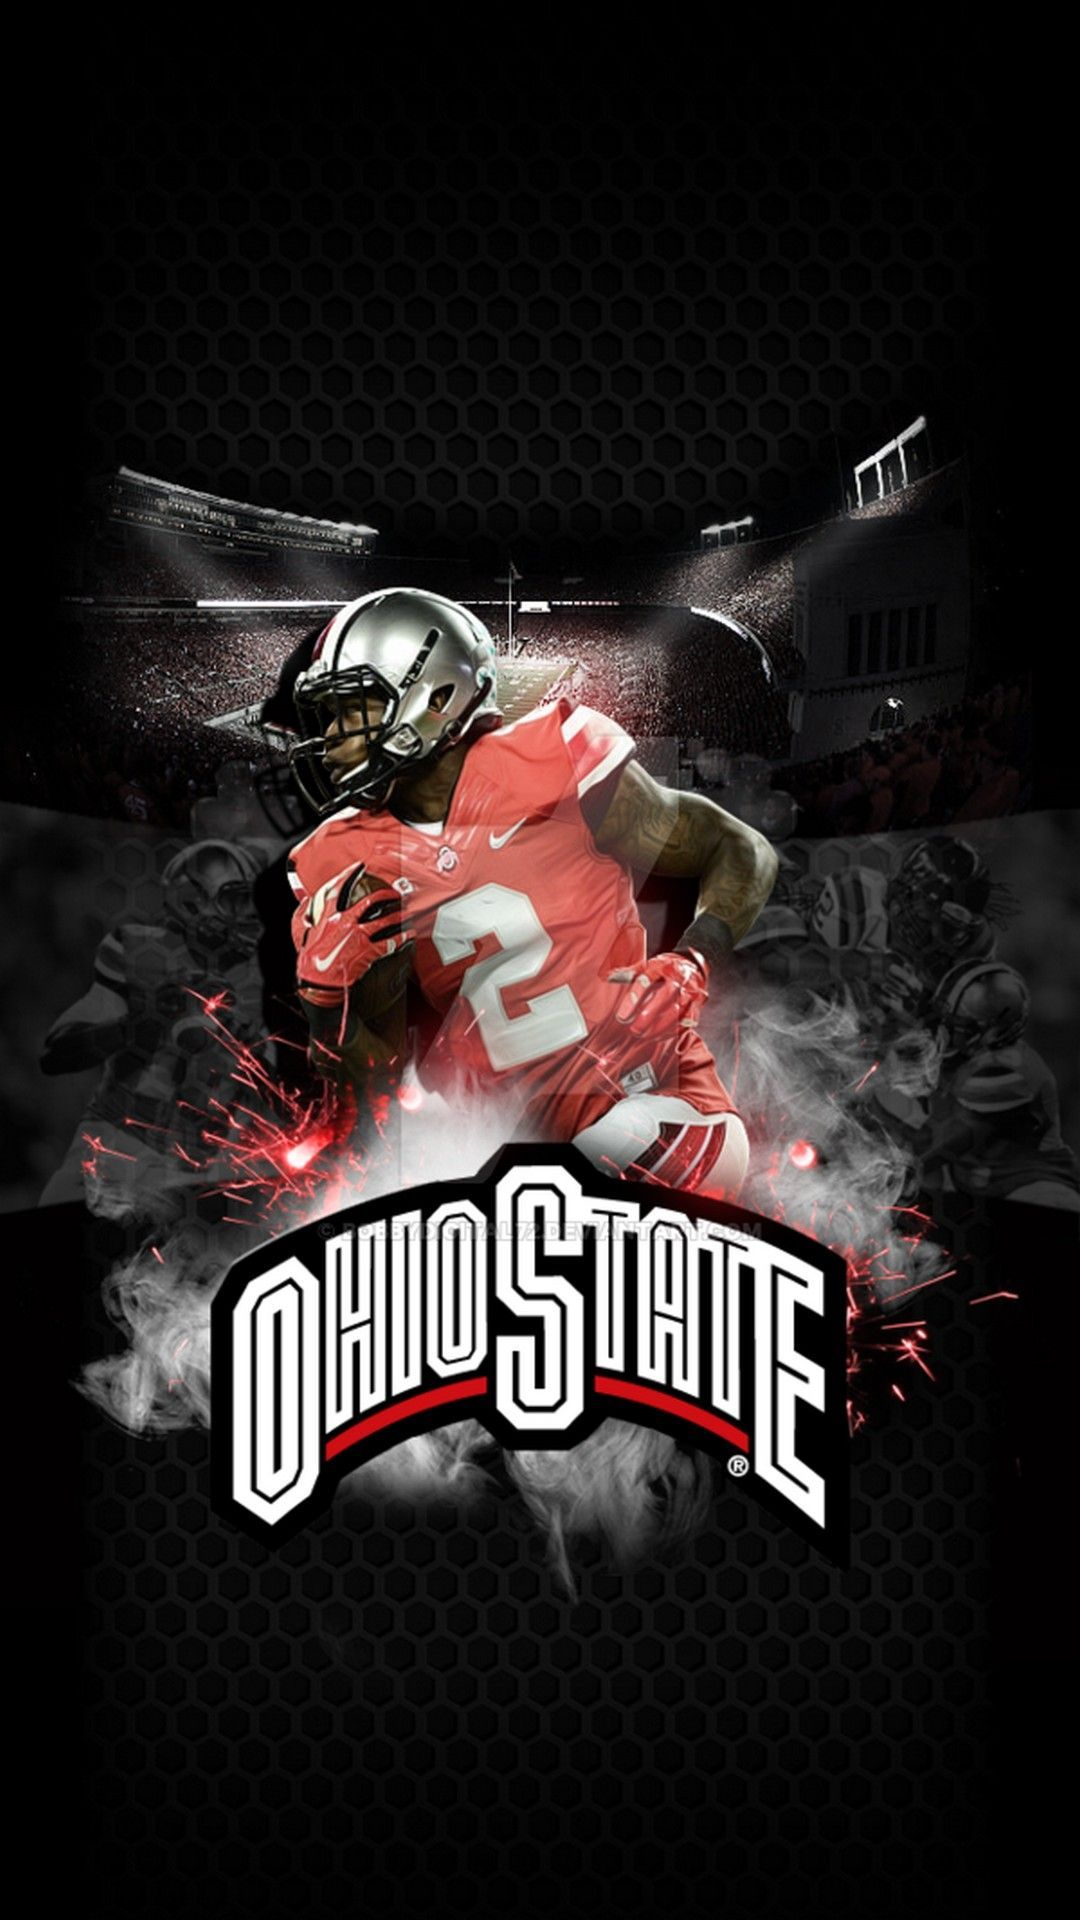 Ohio State Wallpaper In 2020 Ohio State Wallpaper Ohio State Buckeyes Football Ohio State Football Wallpaper